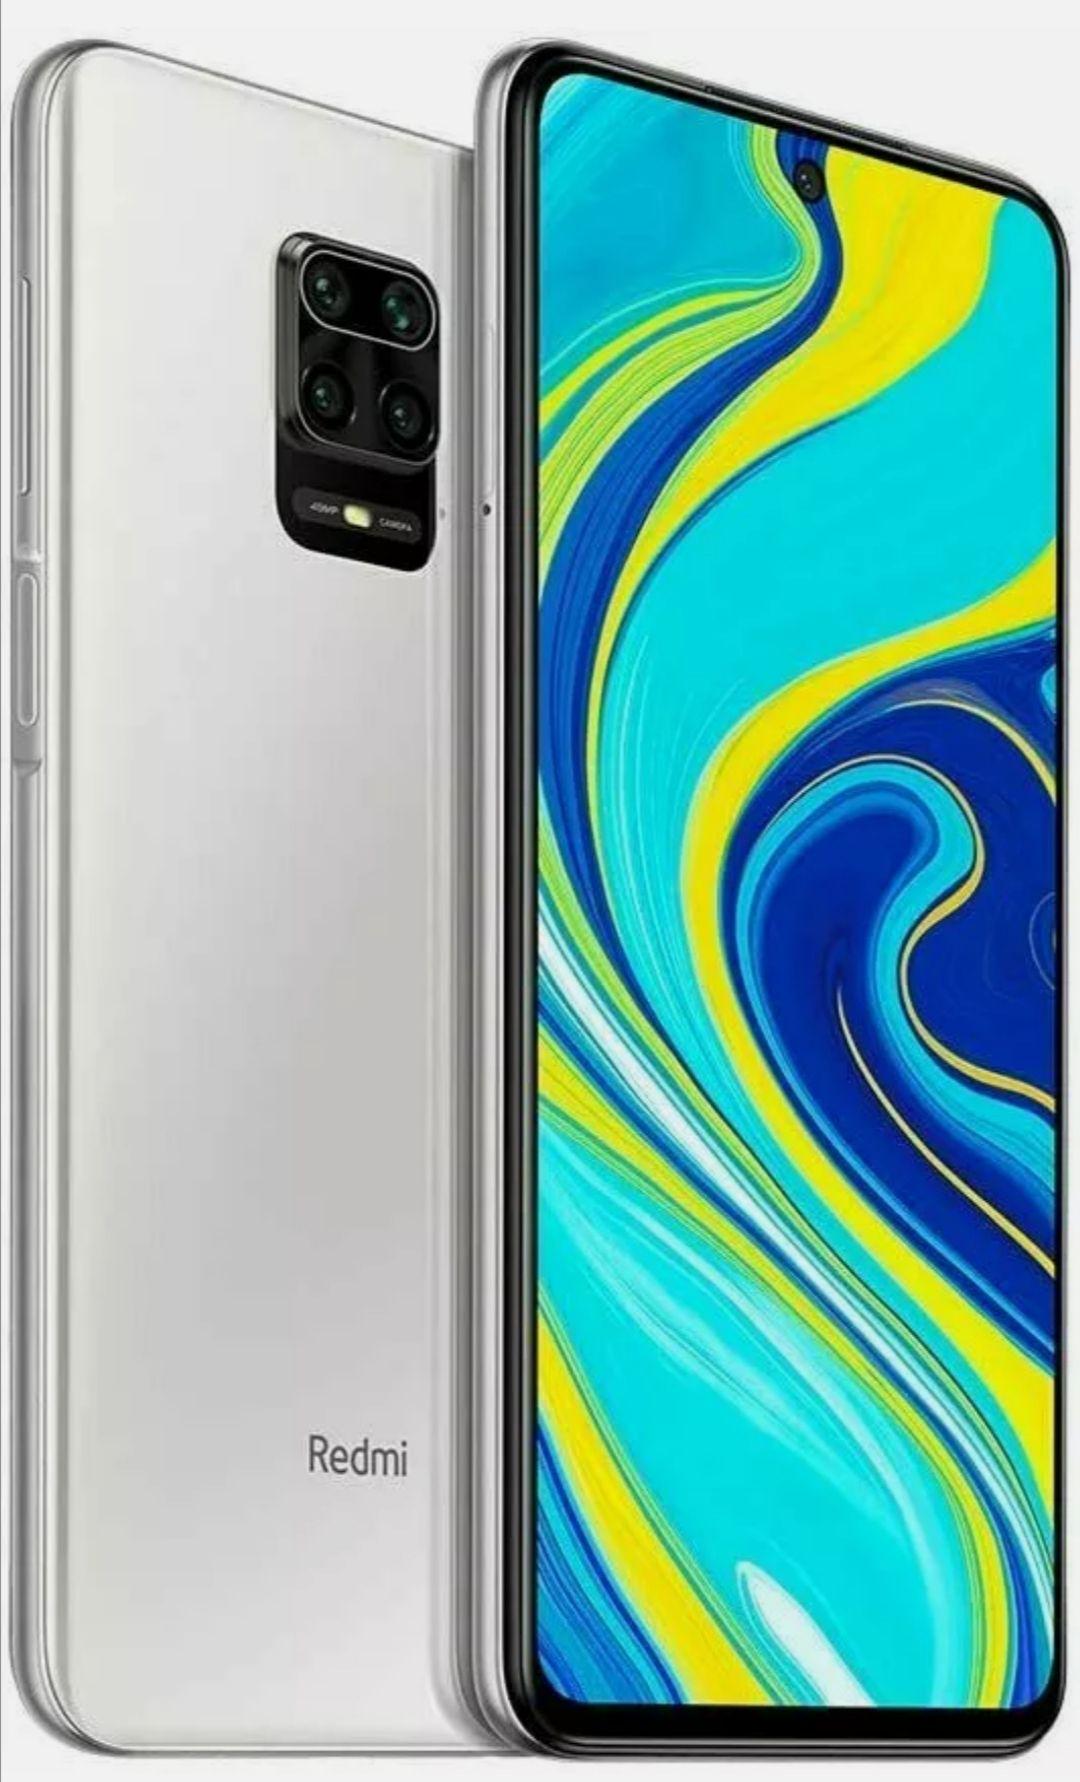 Brand New Xiaomi Redmi Note 9S Grey 64GB 48MP 4GB RAM Smartphone - £143.99 @ UK Trade Deals / Ebay